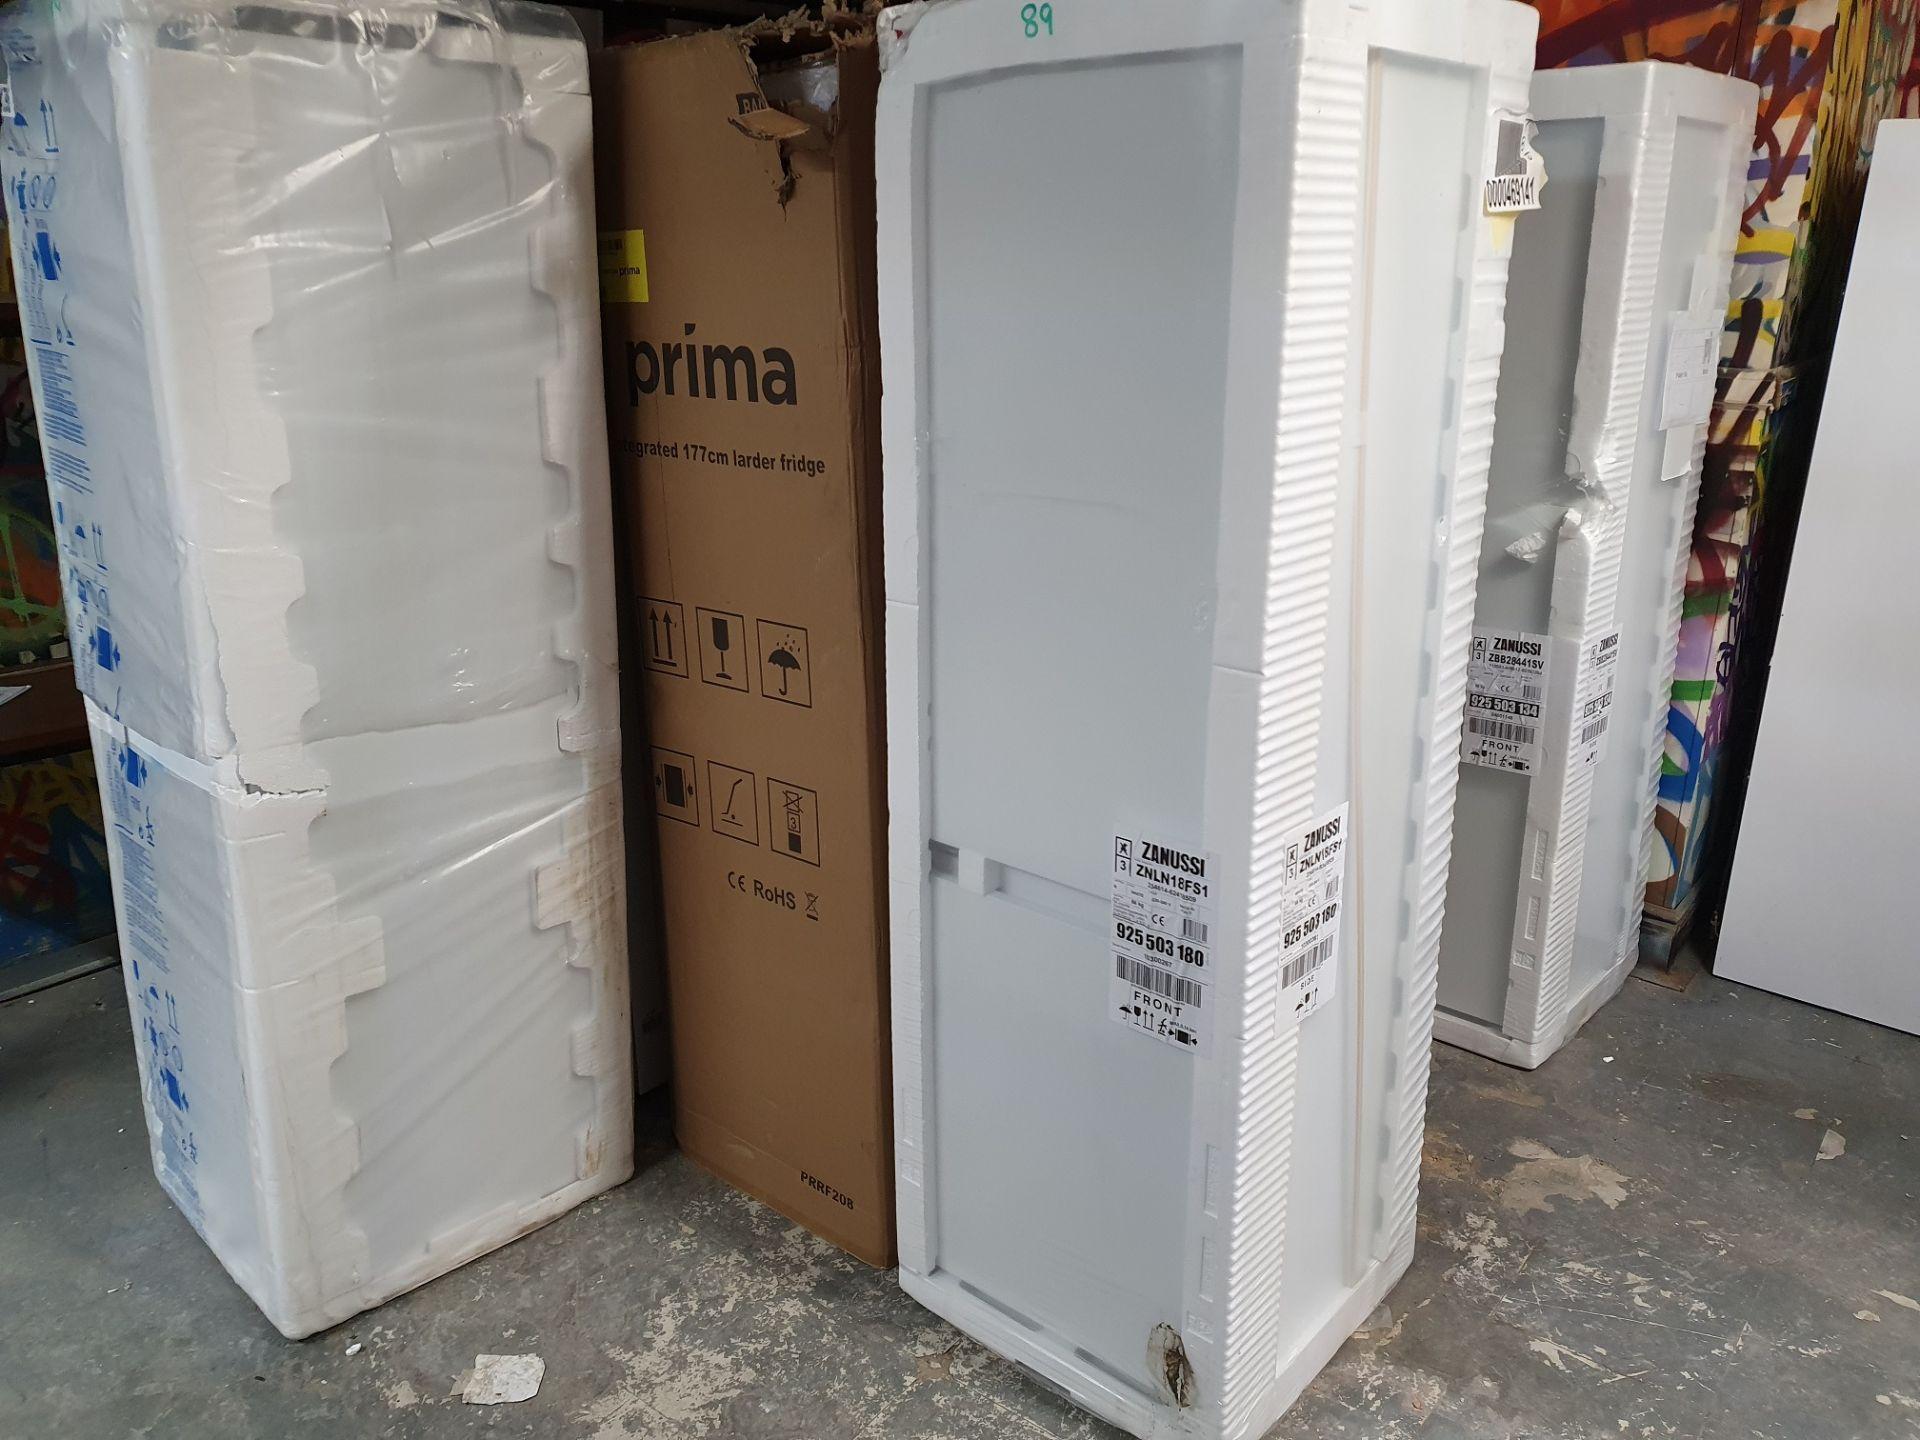 NEW/GRADED AND PACKAGED Zanussi ZBB28441SV Integrated 70/30 Fridge Freezer (Slight external damage) - Image 6 of 14